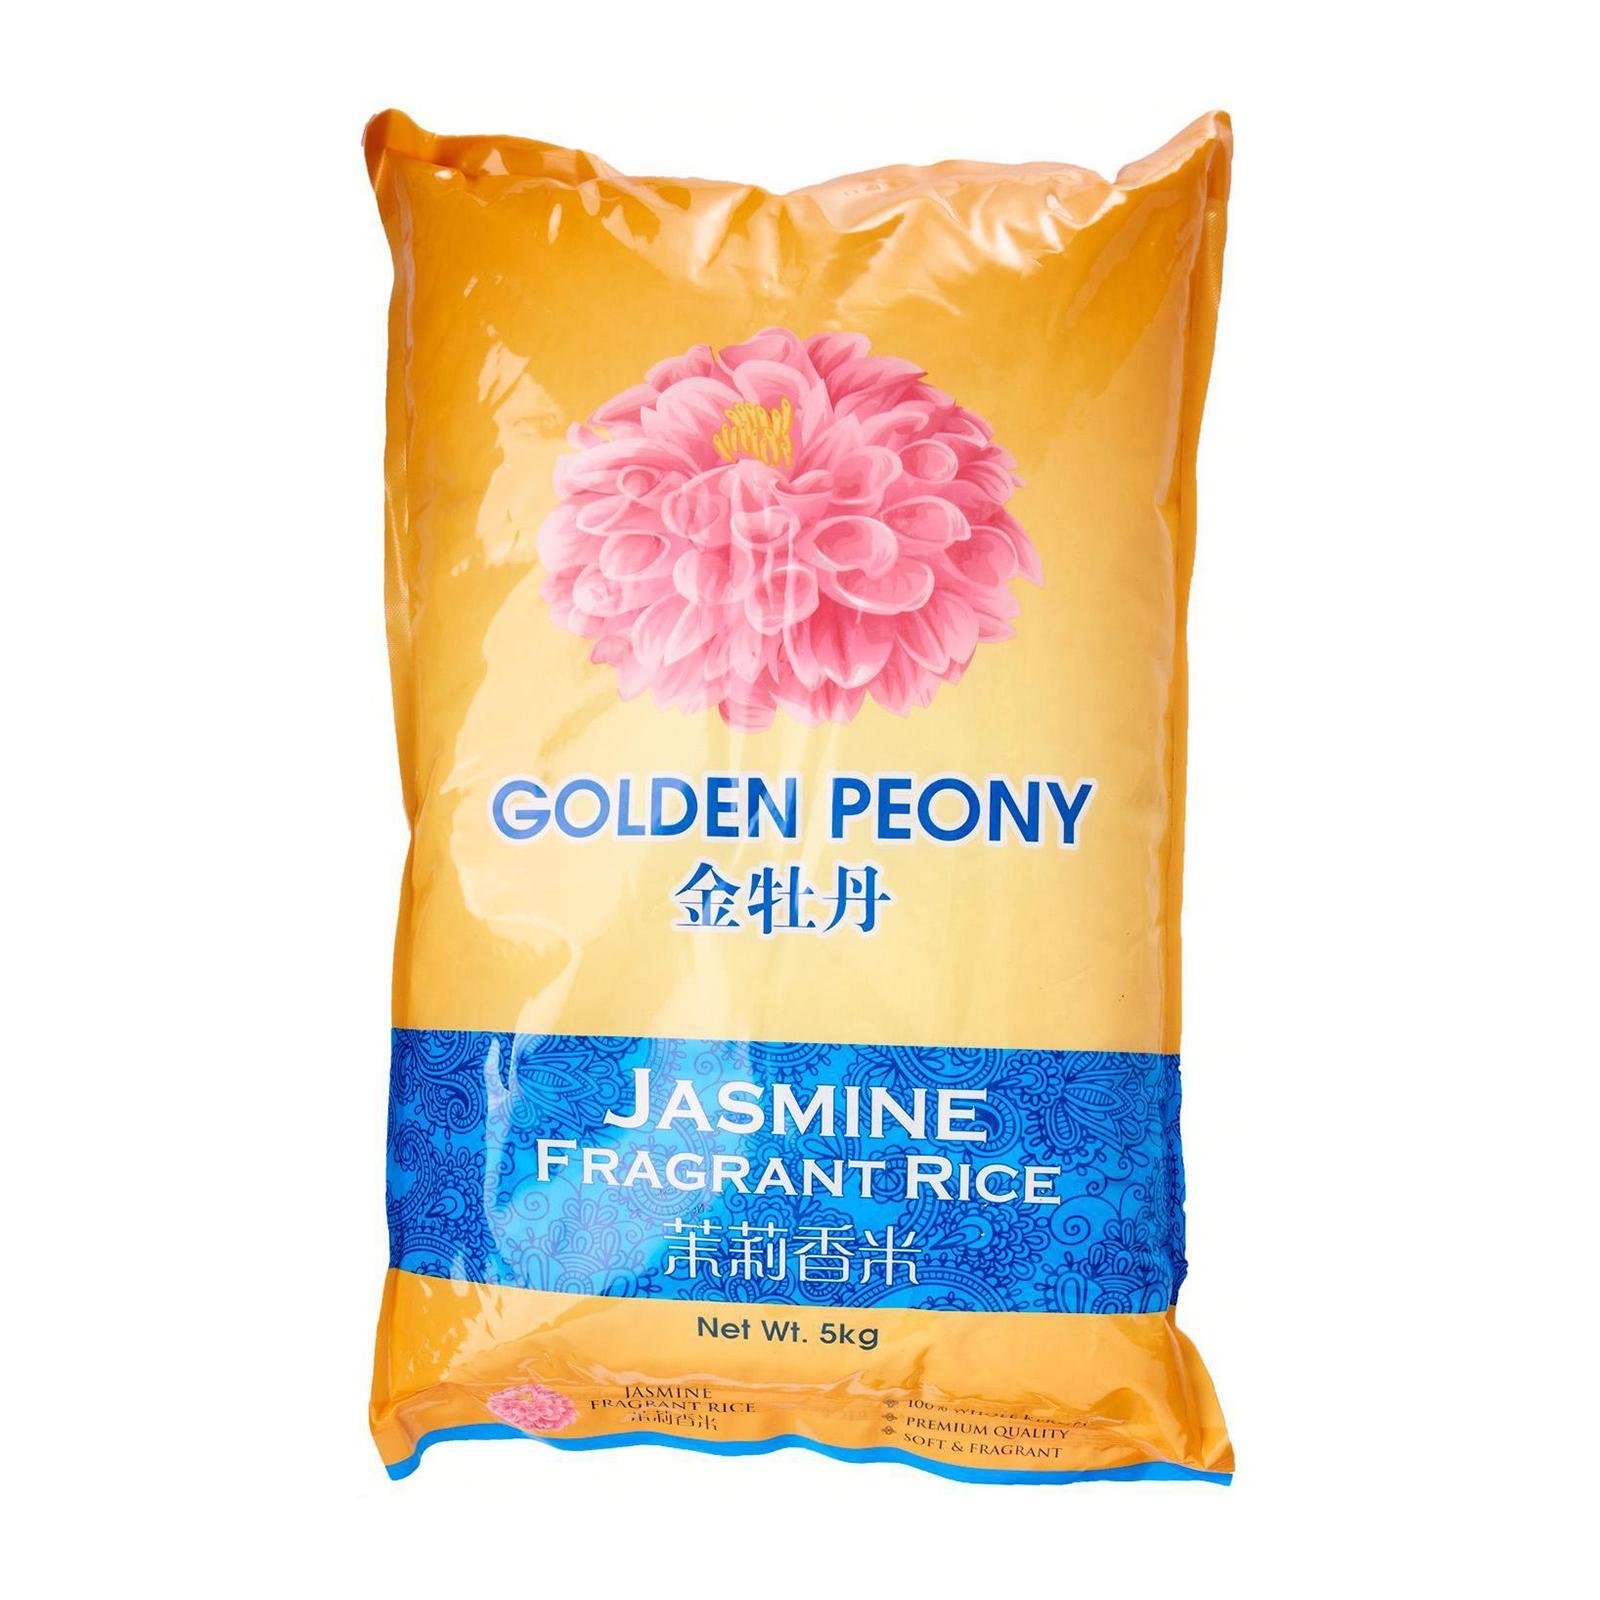 G/Peony Jasmine Fragrant Rice 5KG